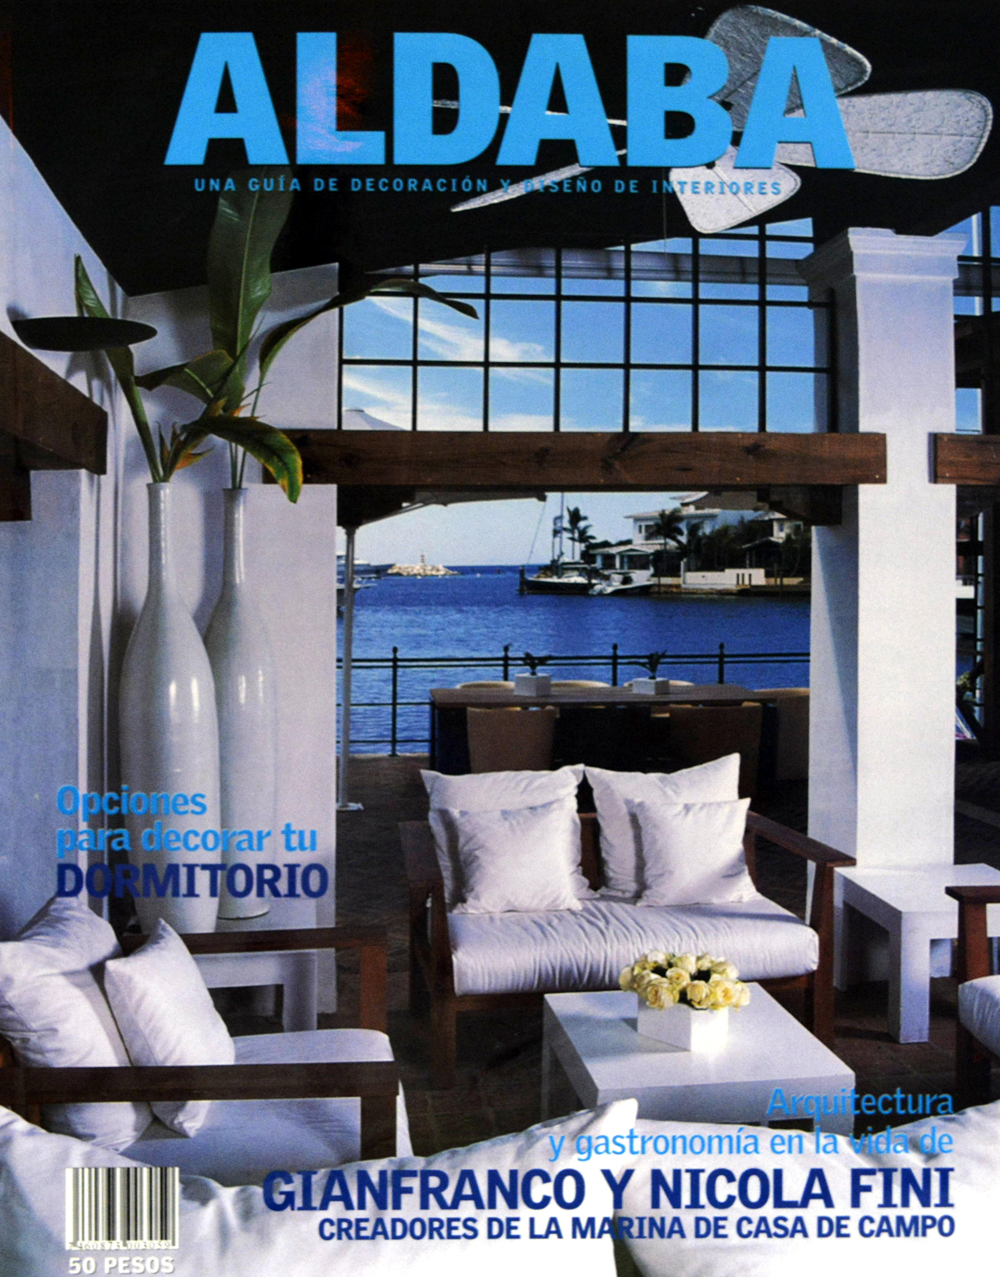 Aldaba- guide to interior decoration